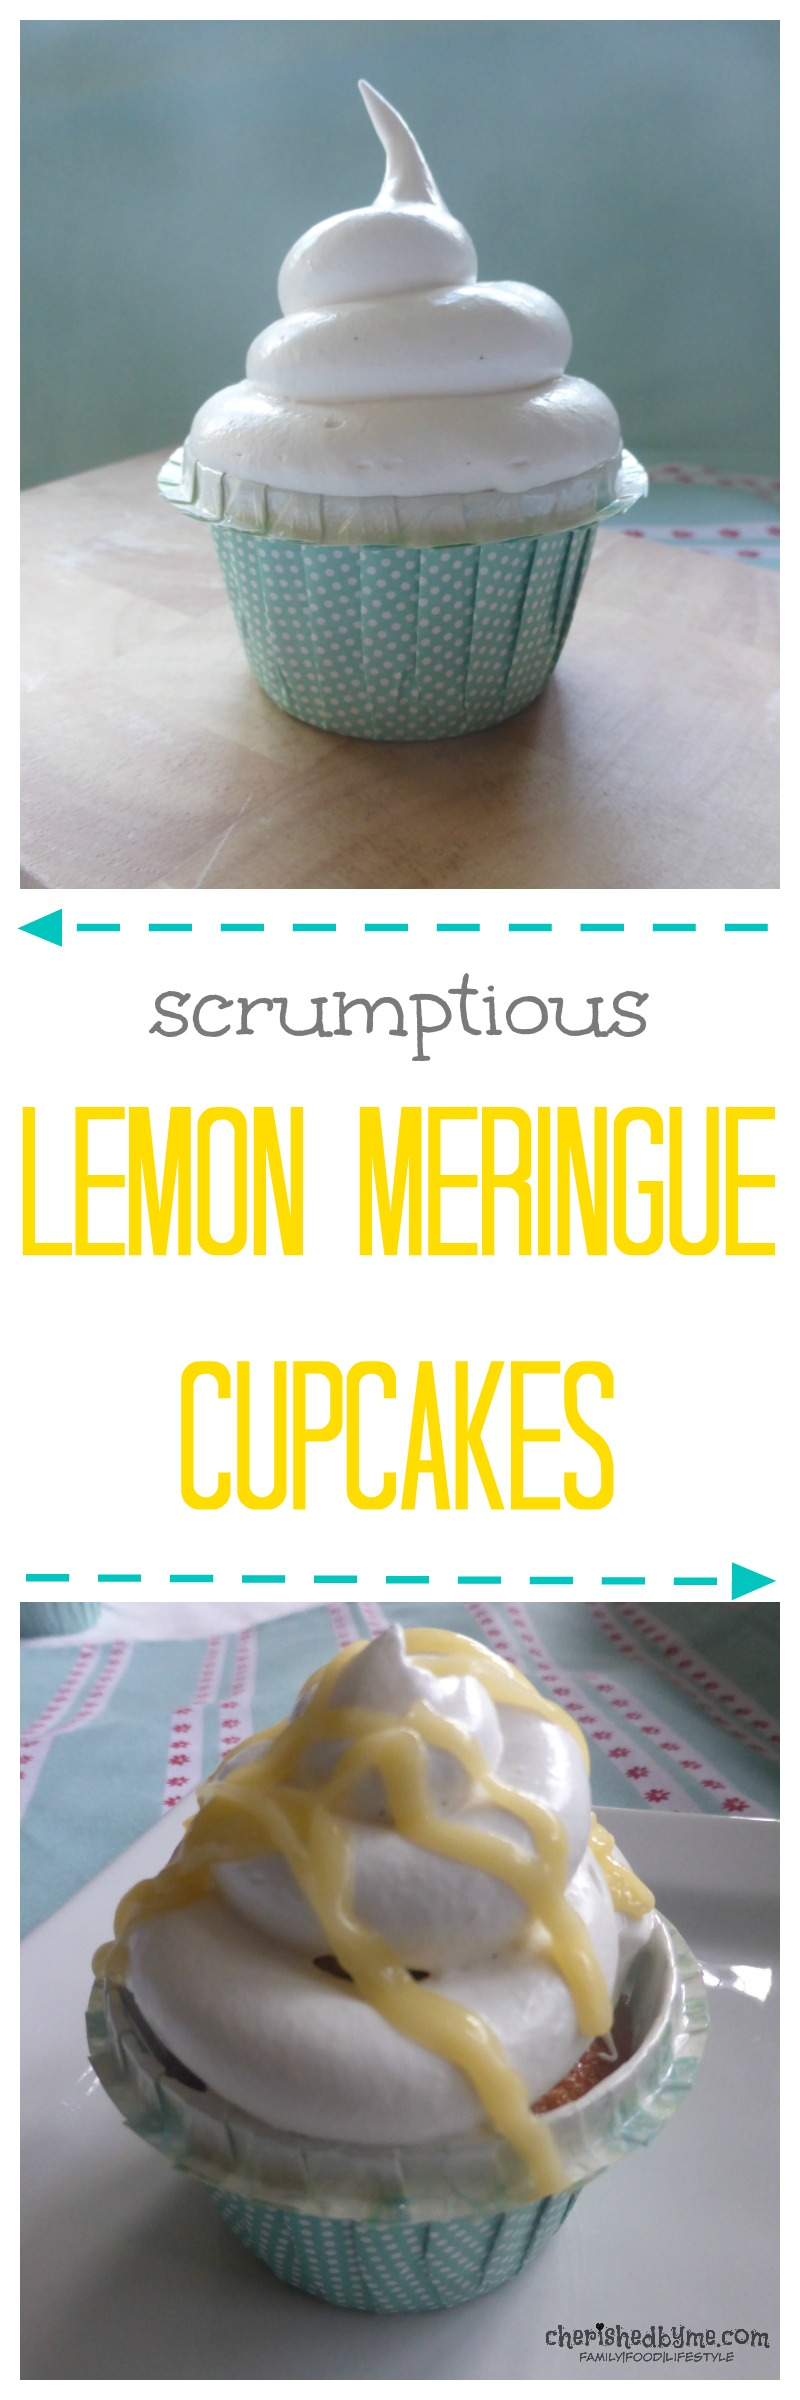 Delicious lemon meringue cupcakes- cherishedbyme